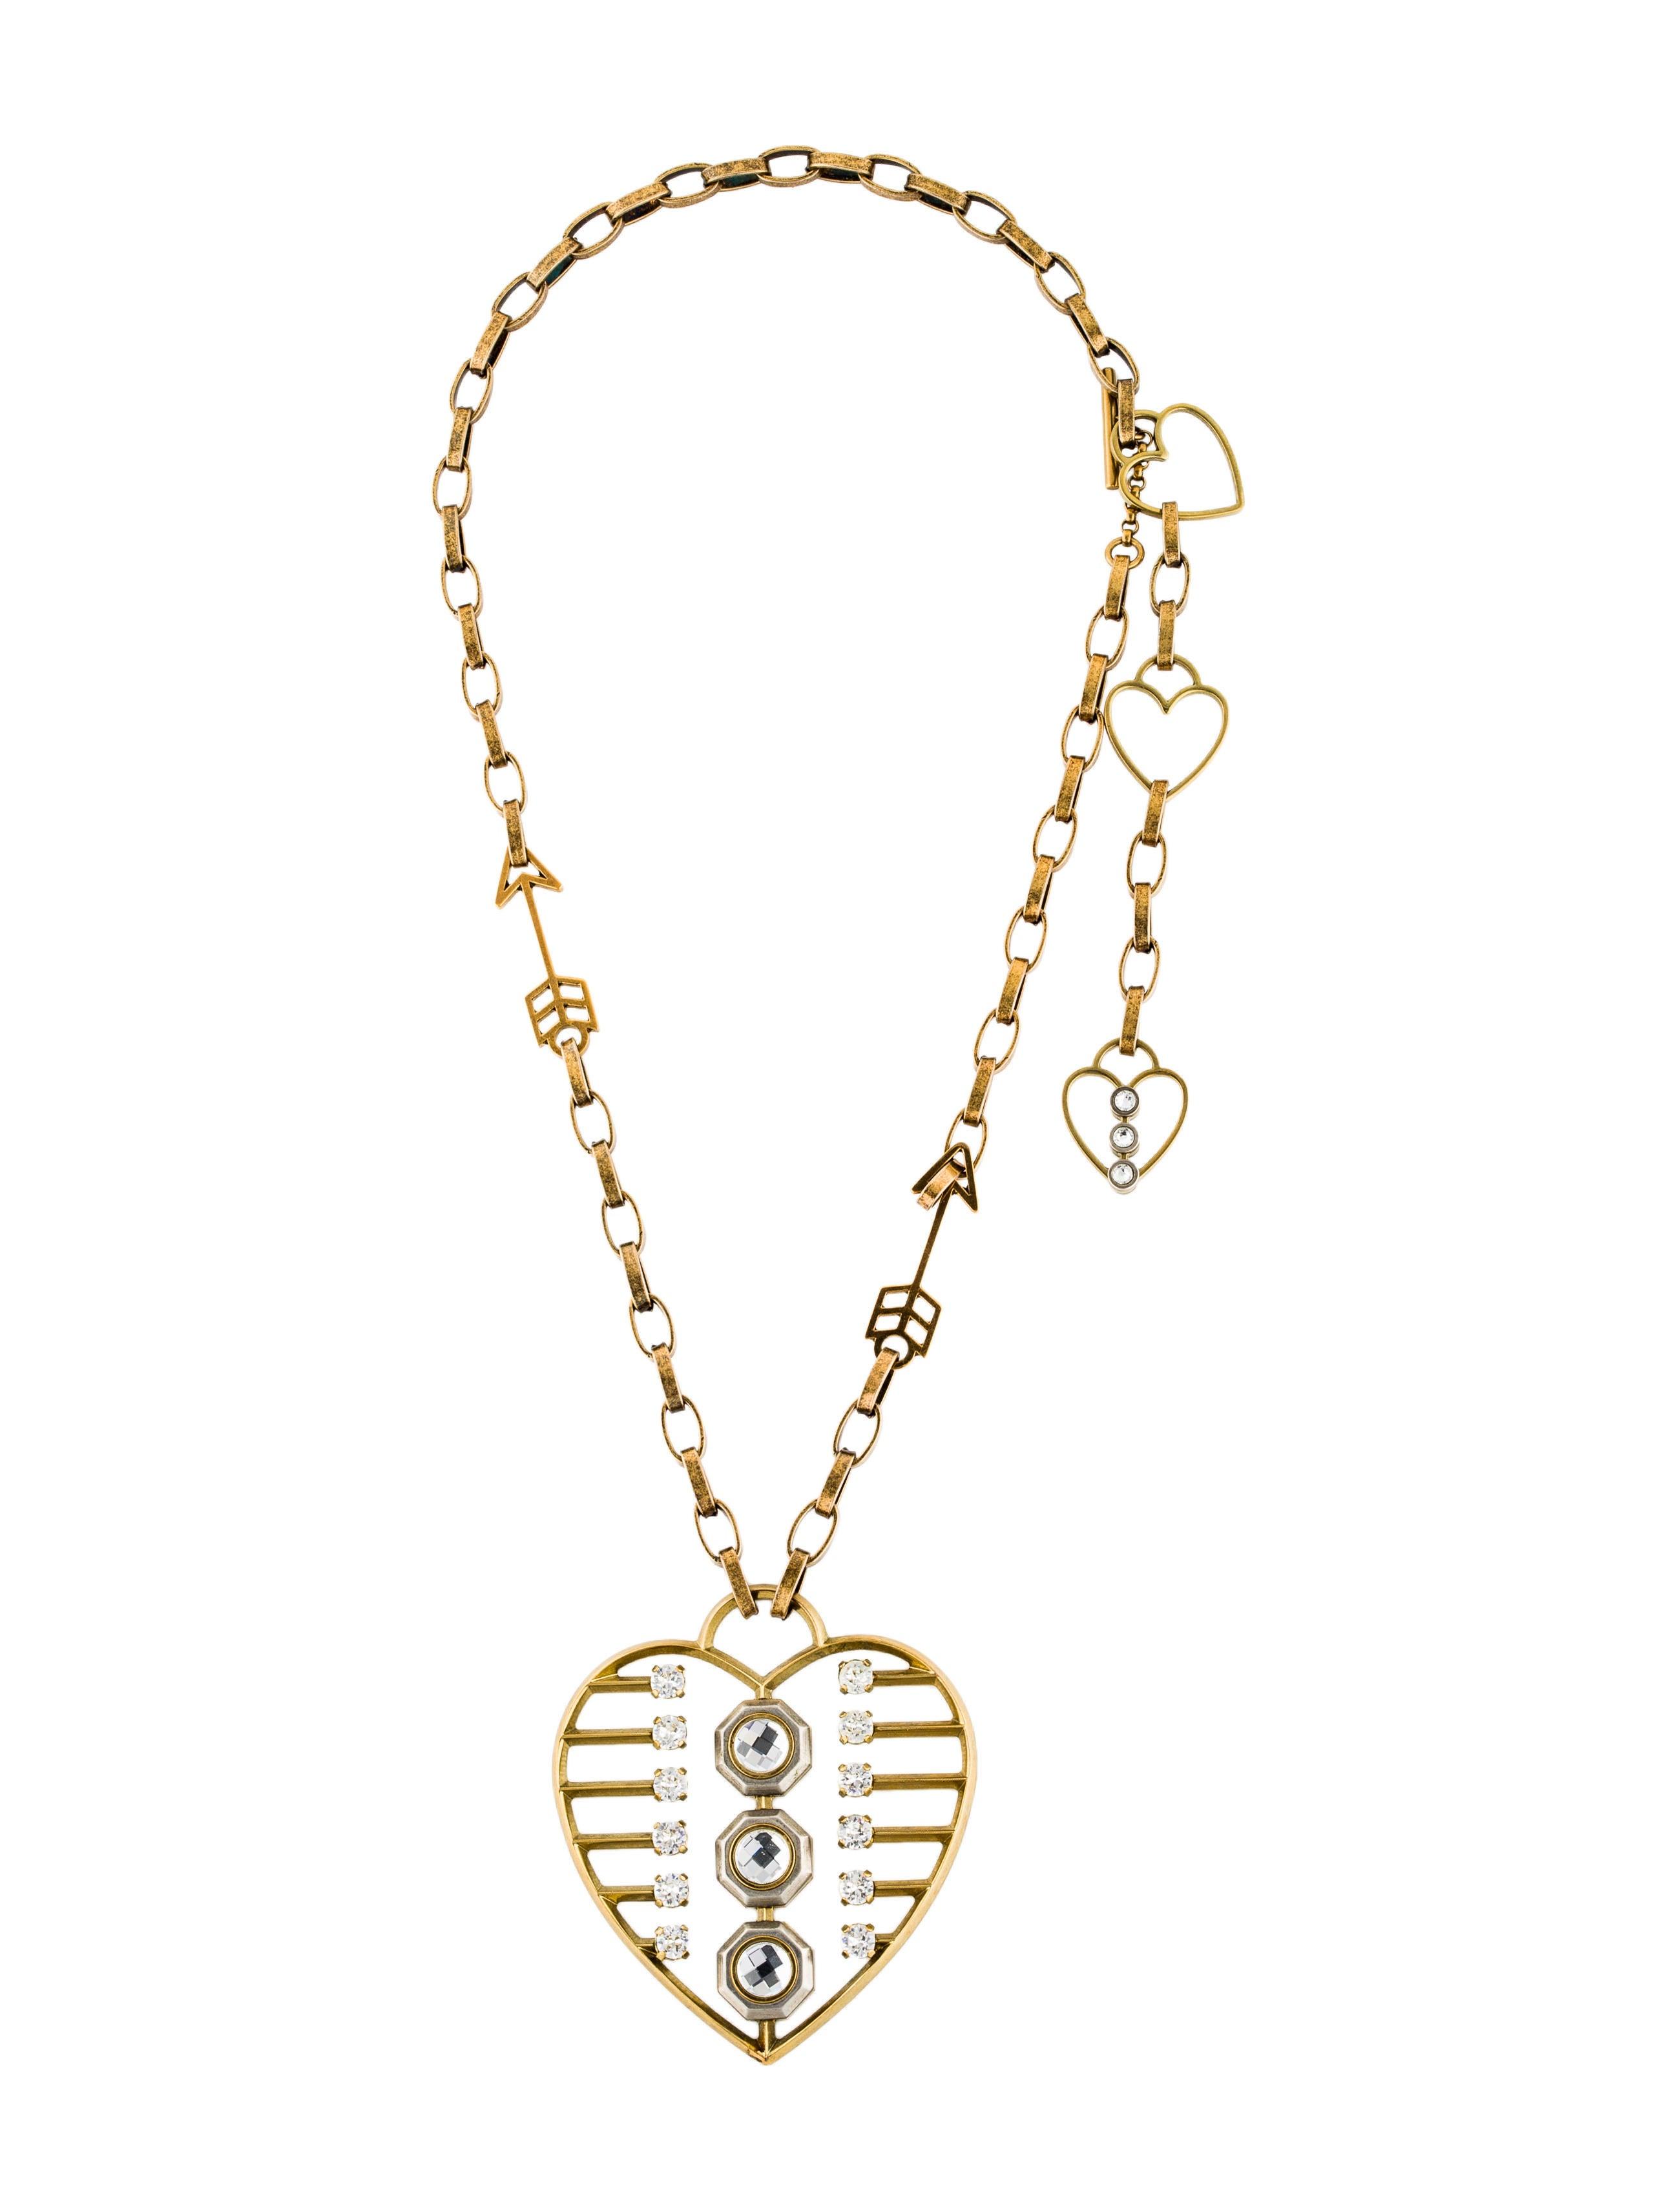 Lanvin crystal heart pendant necklace necklaces lan70284 the crystal heart pendant necklace aloadofball Images